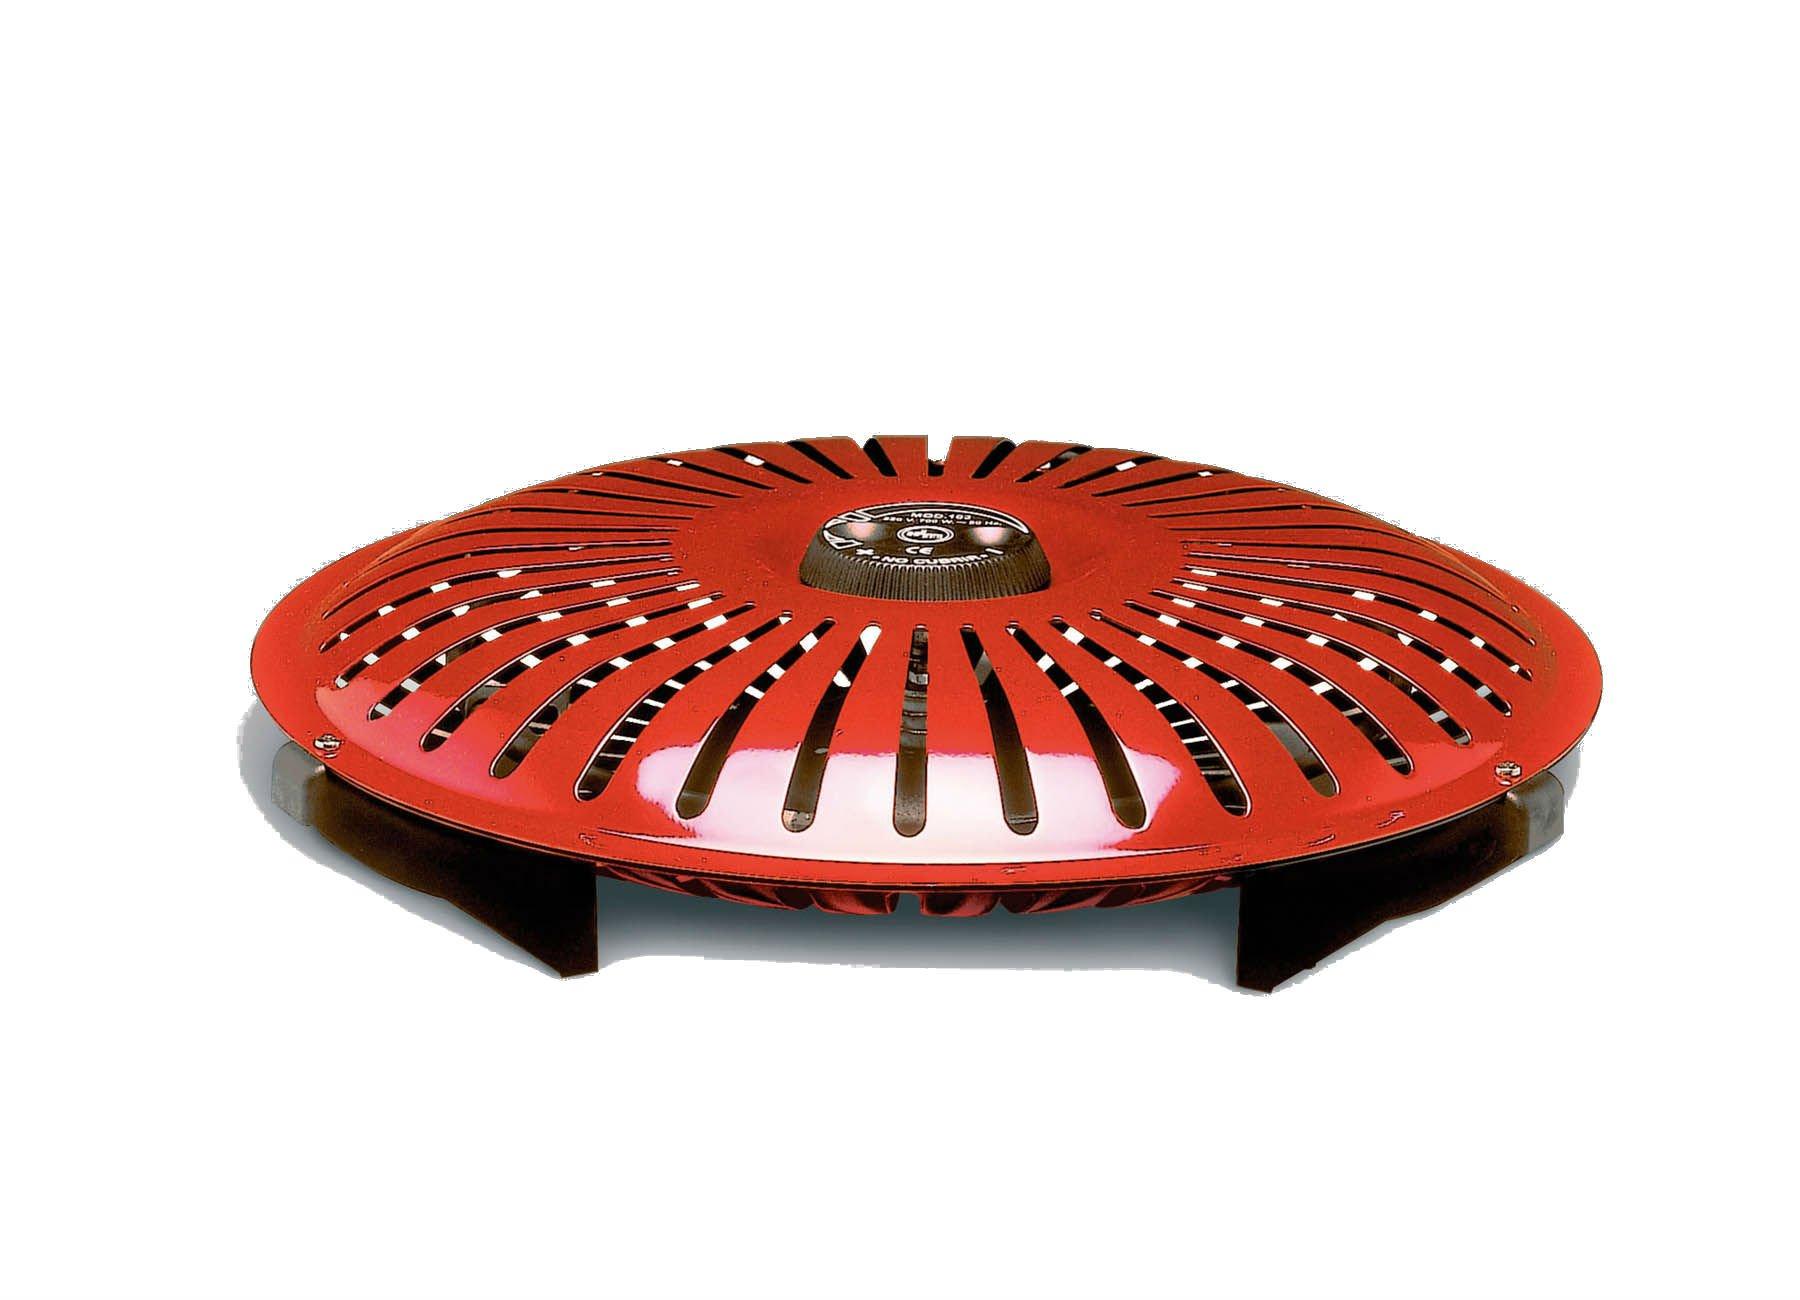 HJM 105 radiador - Calefactor product image